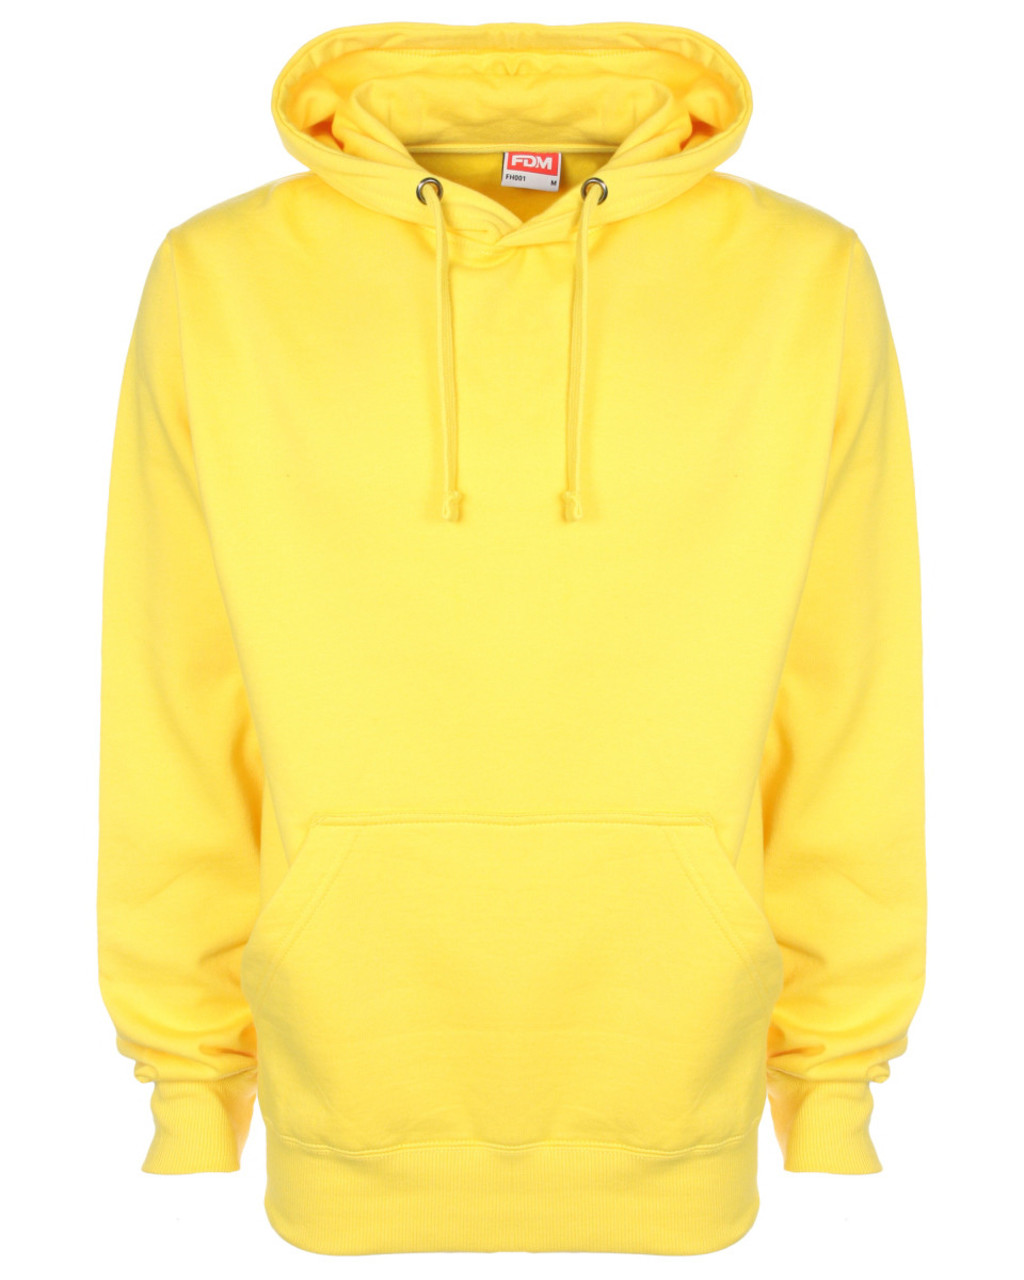 FDM Unisex Plain Original Hoodie Sweatshirt Pullover Hoody (fh001 ...